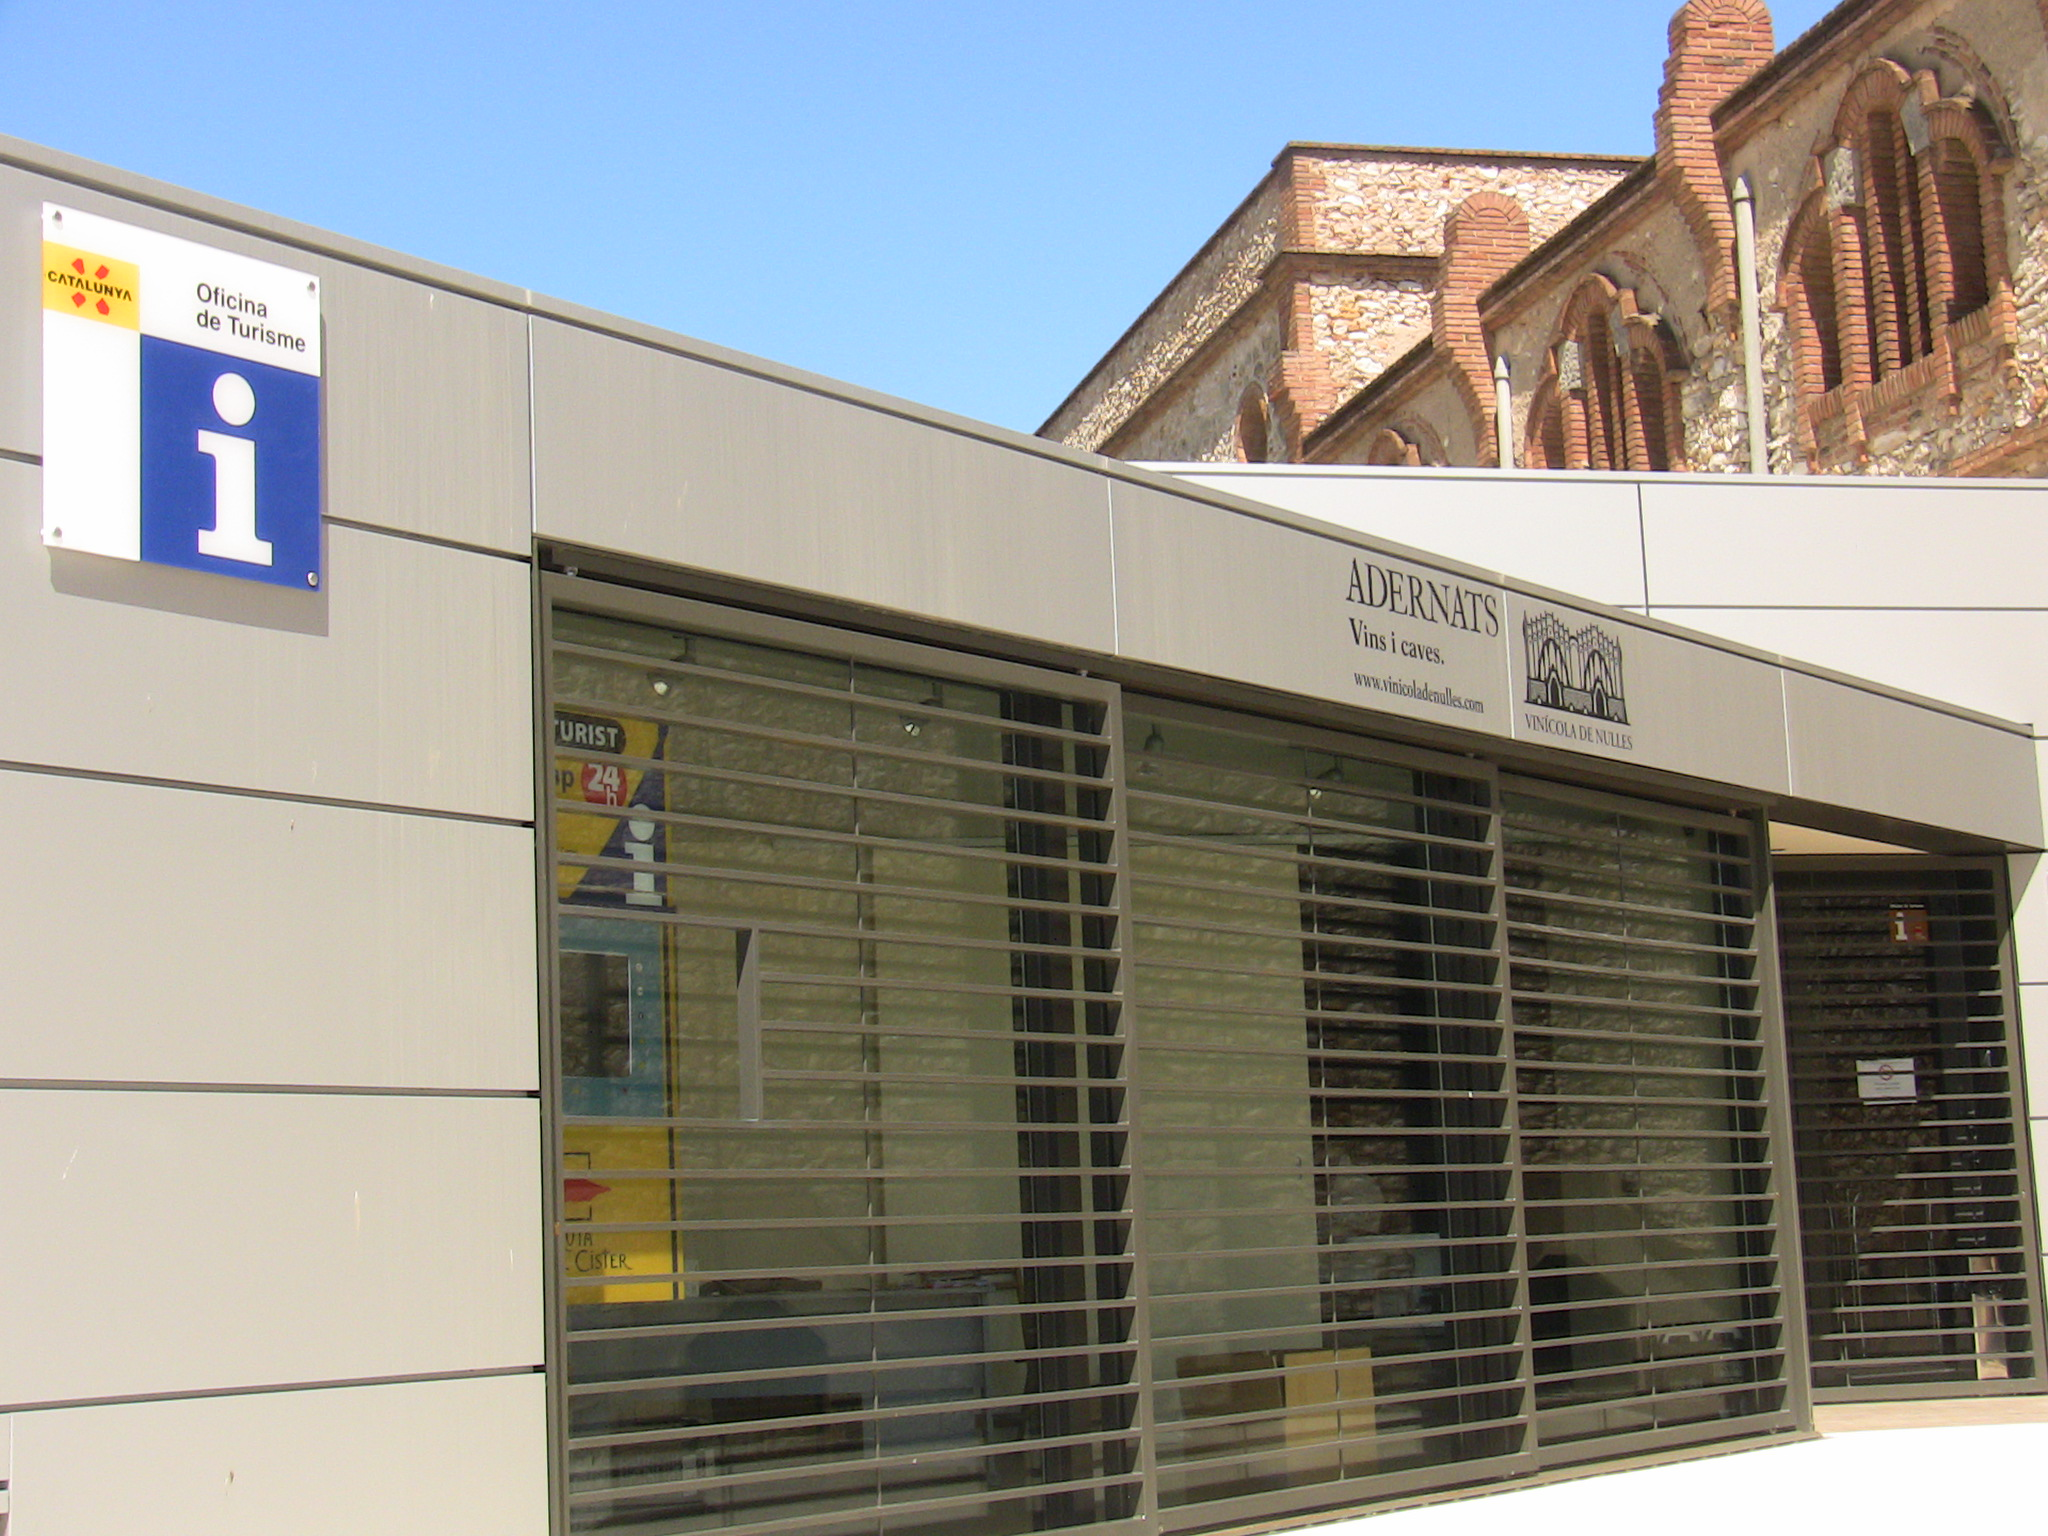 Oficina de turisme ajuntament denulles for Oficina de turisme